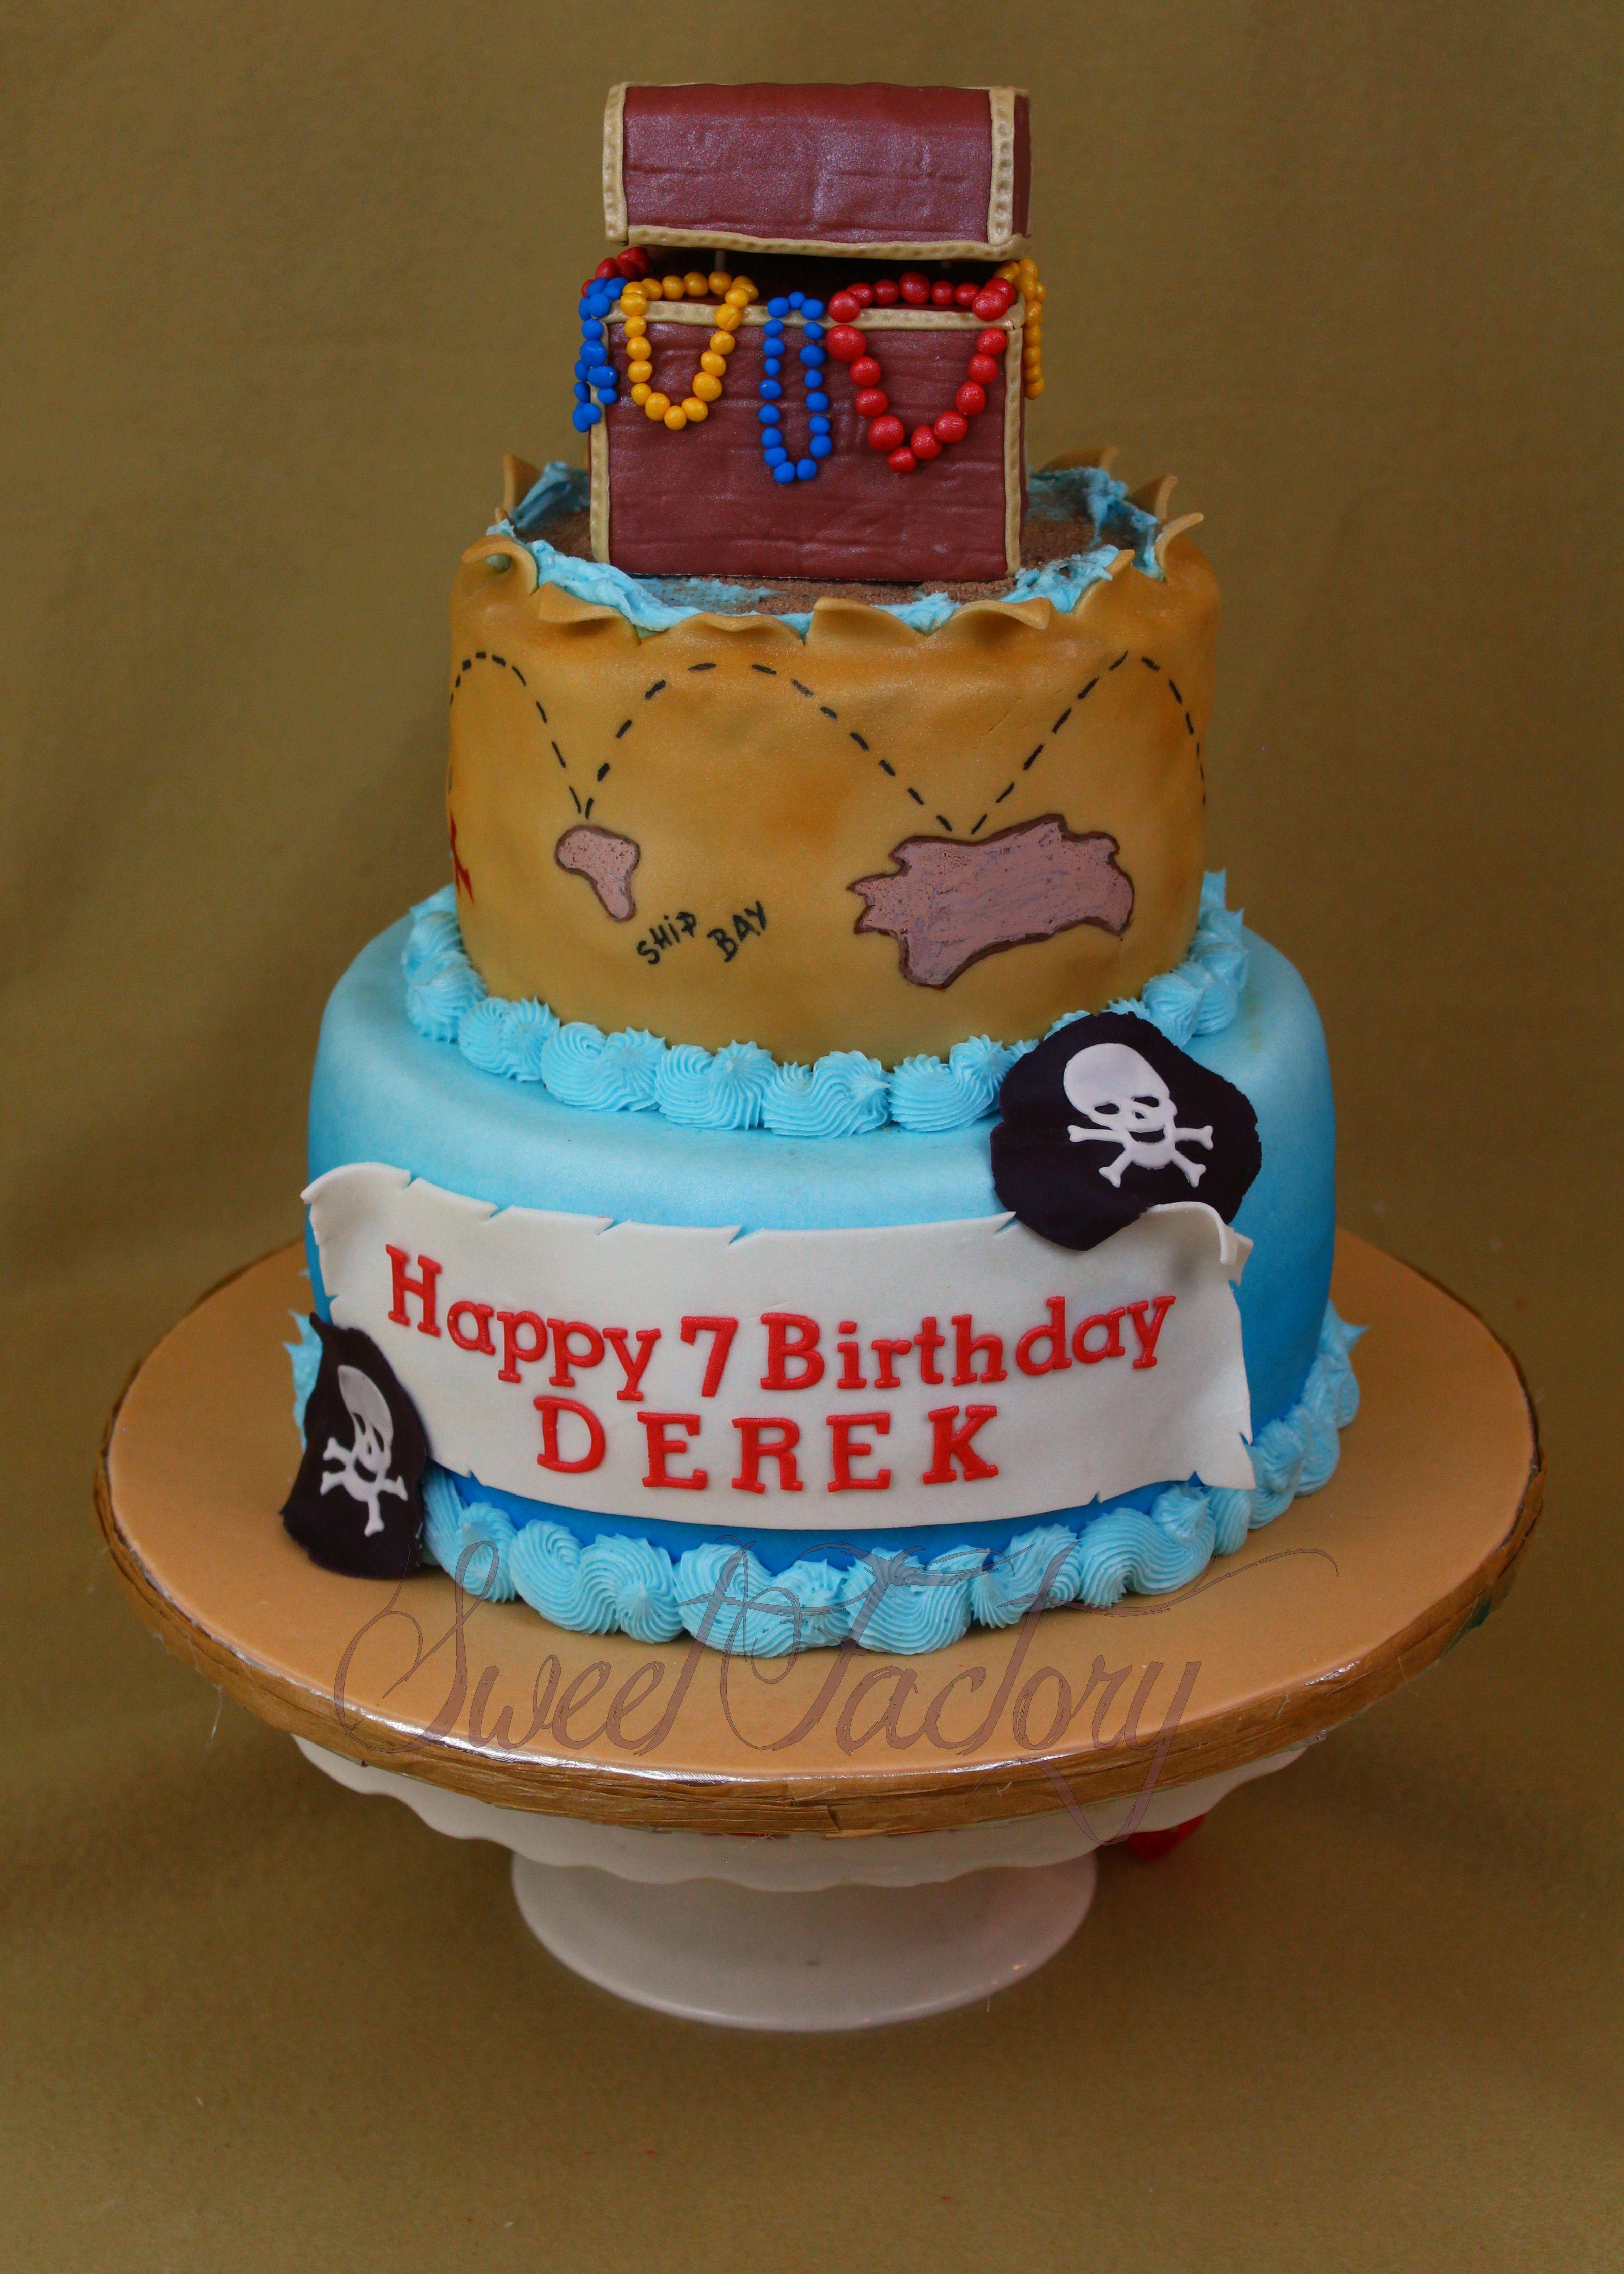 Cake ideas on pinterest pirate cakes marshmallow fondant and - Birthday Boy Cake Pirates Of The Caribbean Cake Pirates Cake